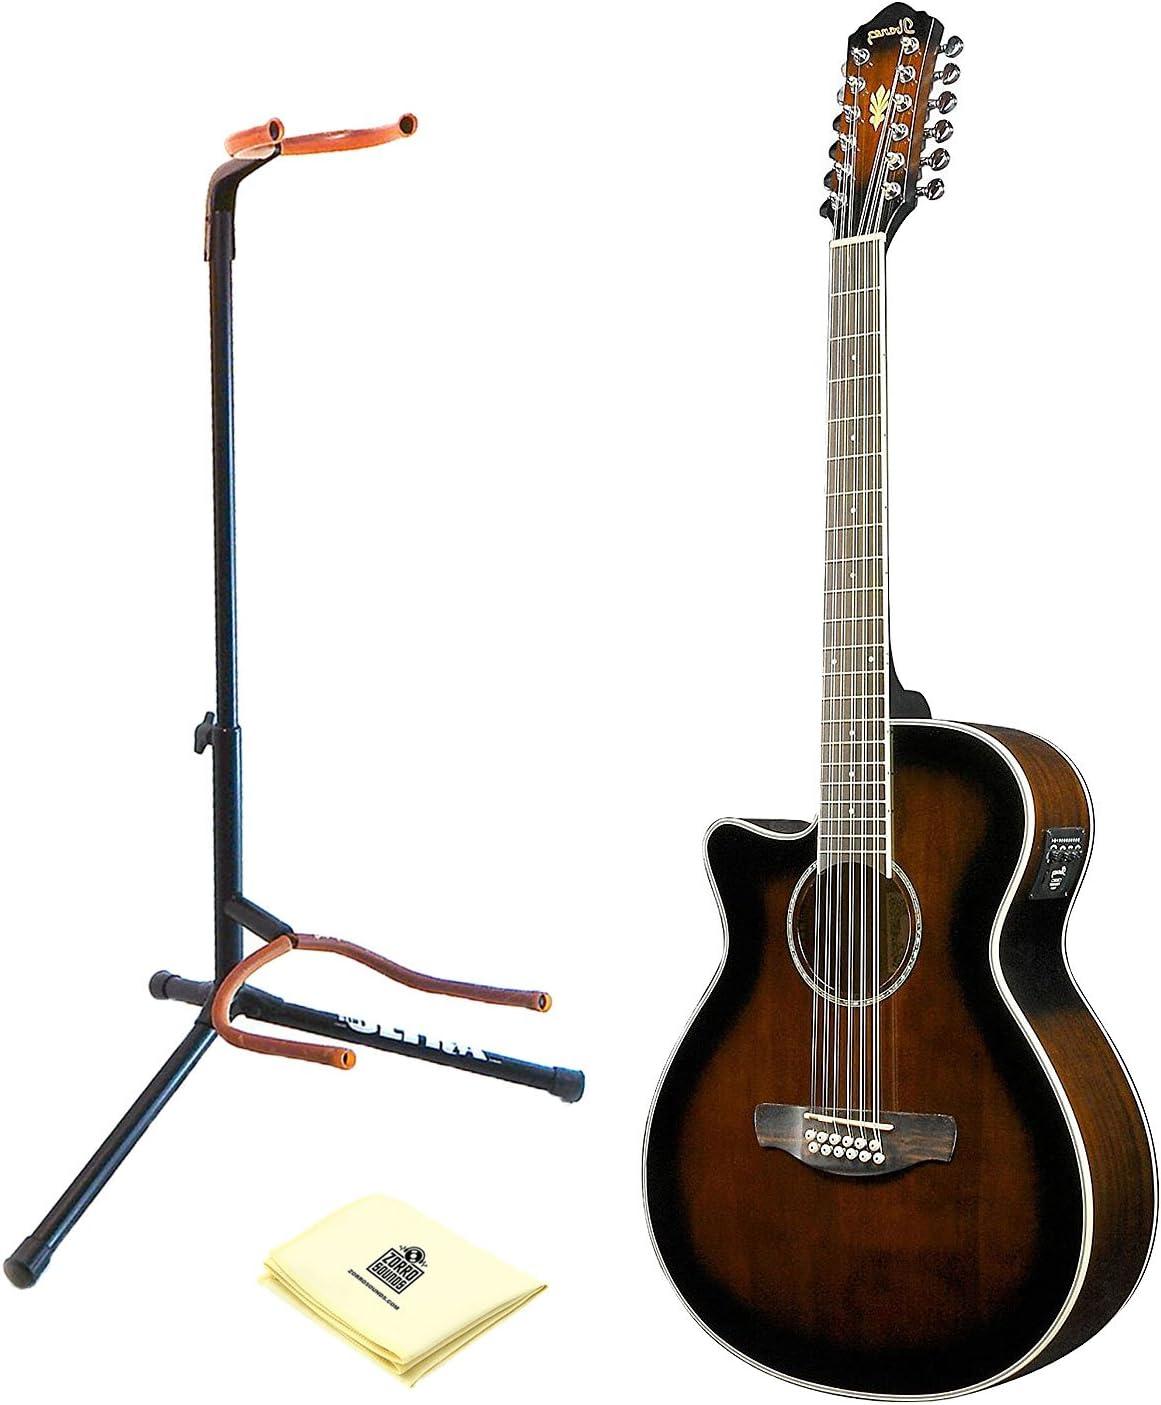 Ibanez aeg1812iidvs 12-string Electroacústica guitarra oscuro ...